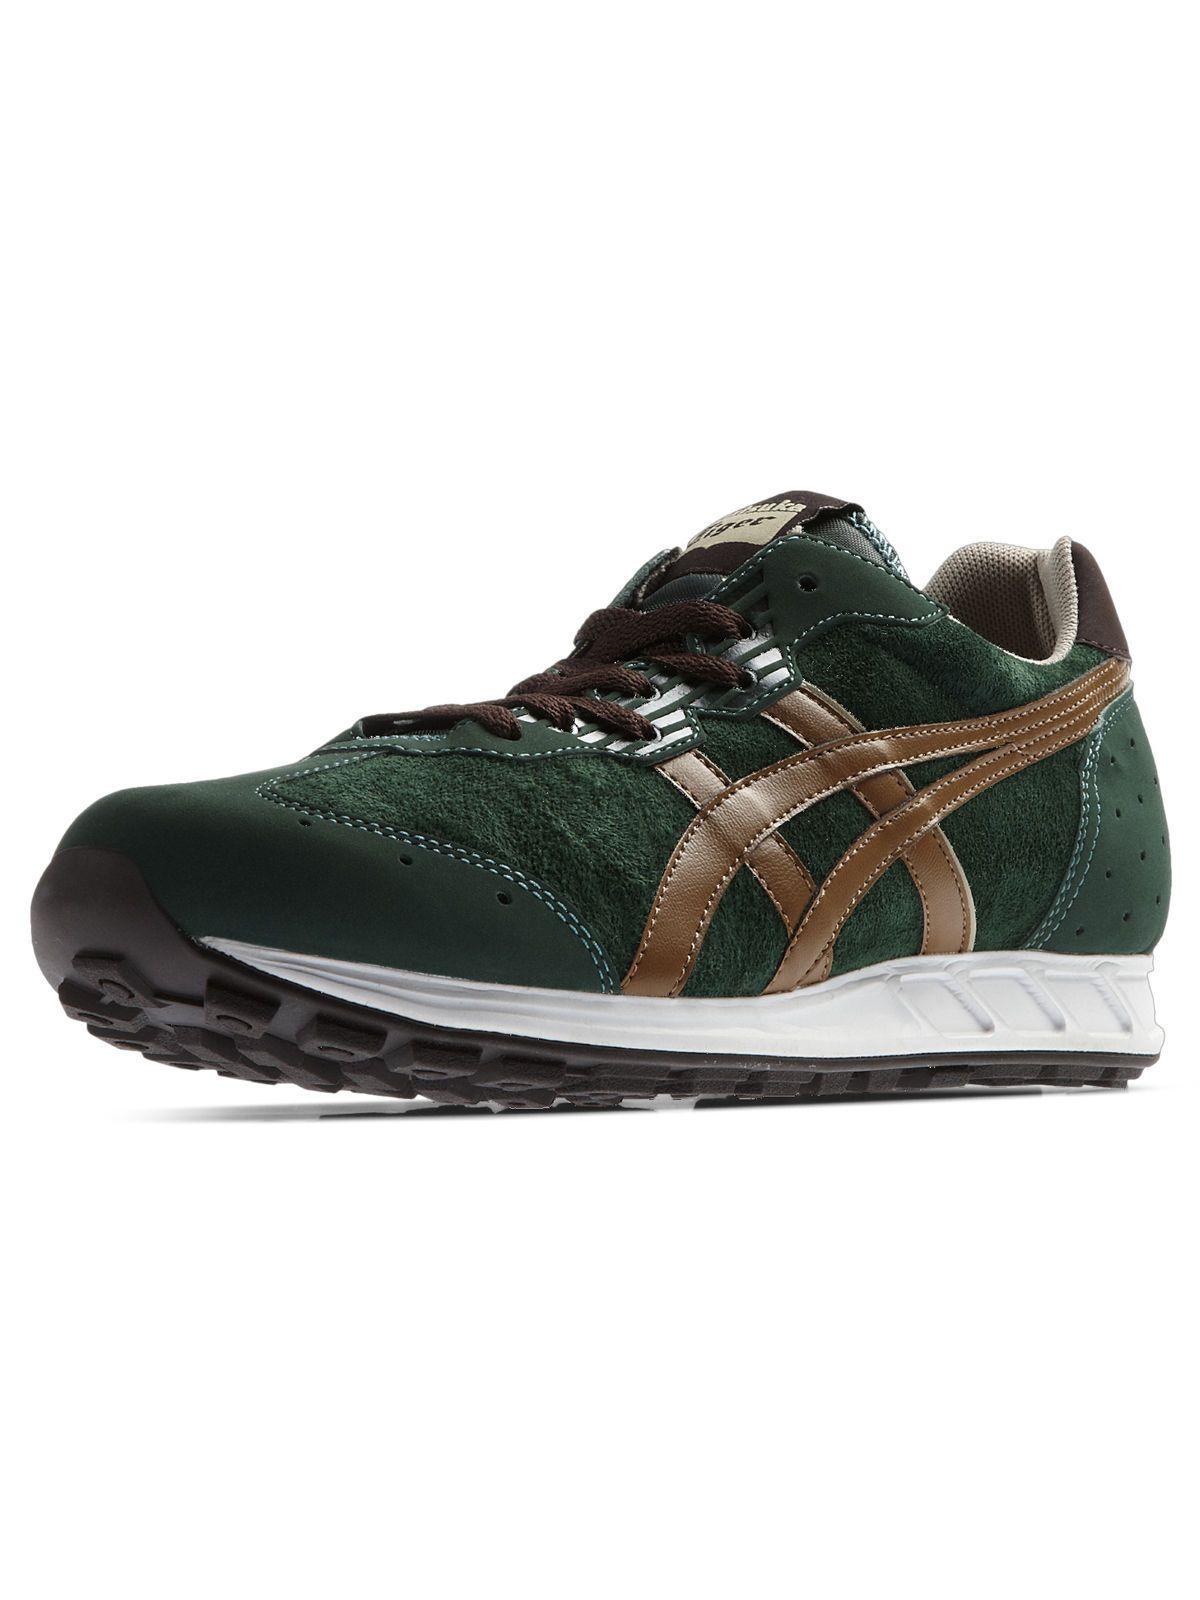 4ac87562d1d5 Onitsuka Tiger T-Stormer Sneaker Pineneedle   Bronze Brown